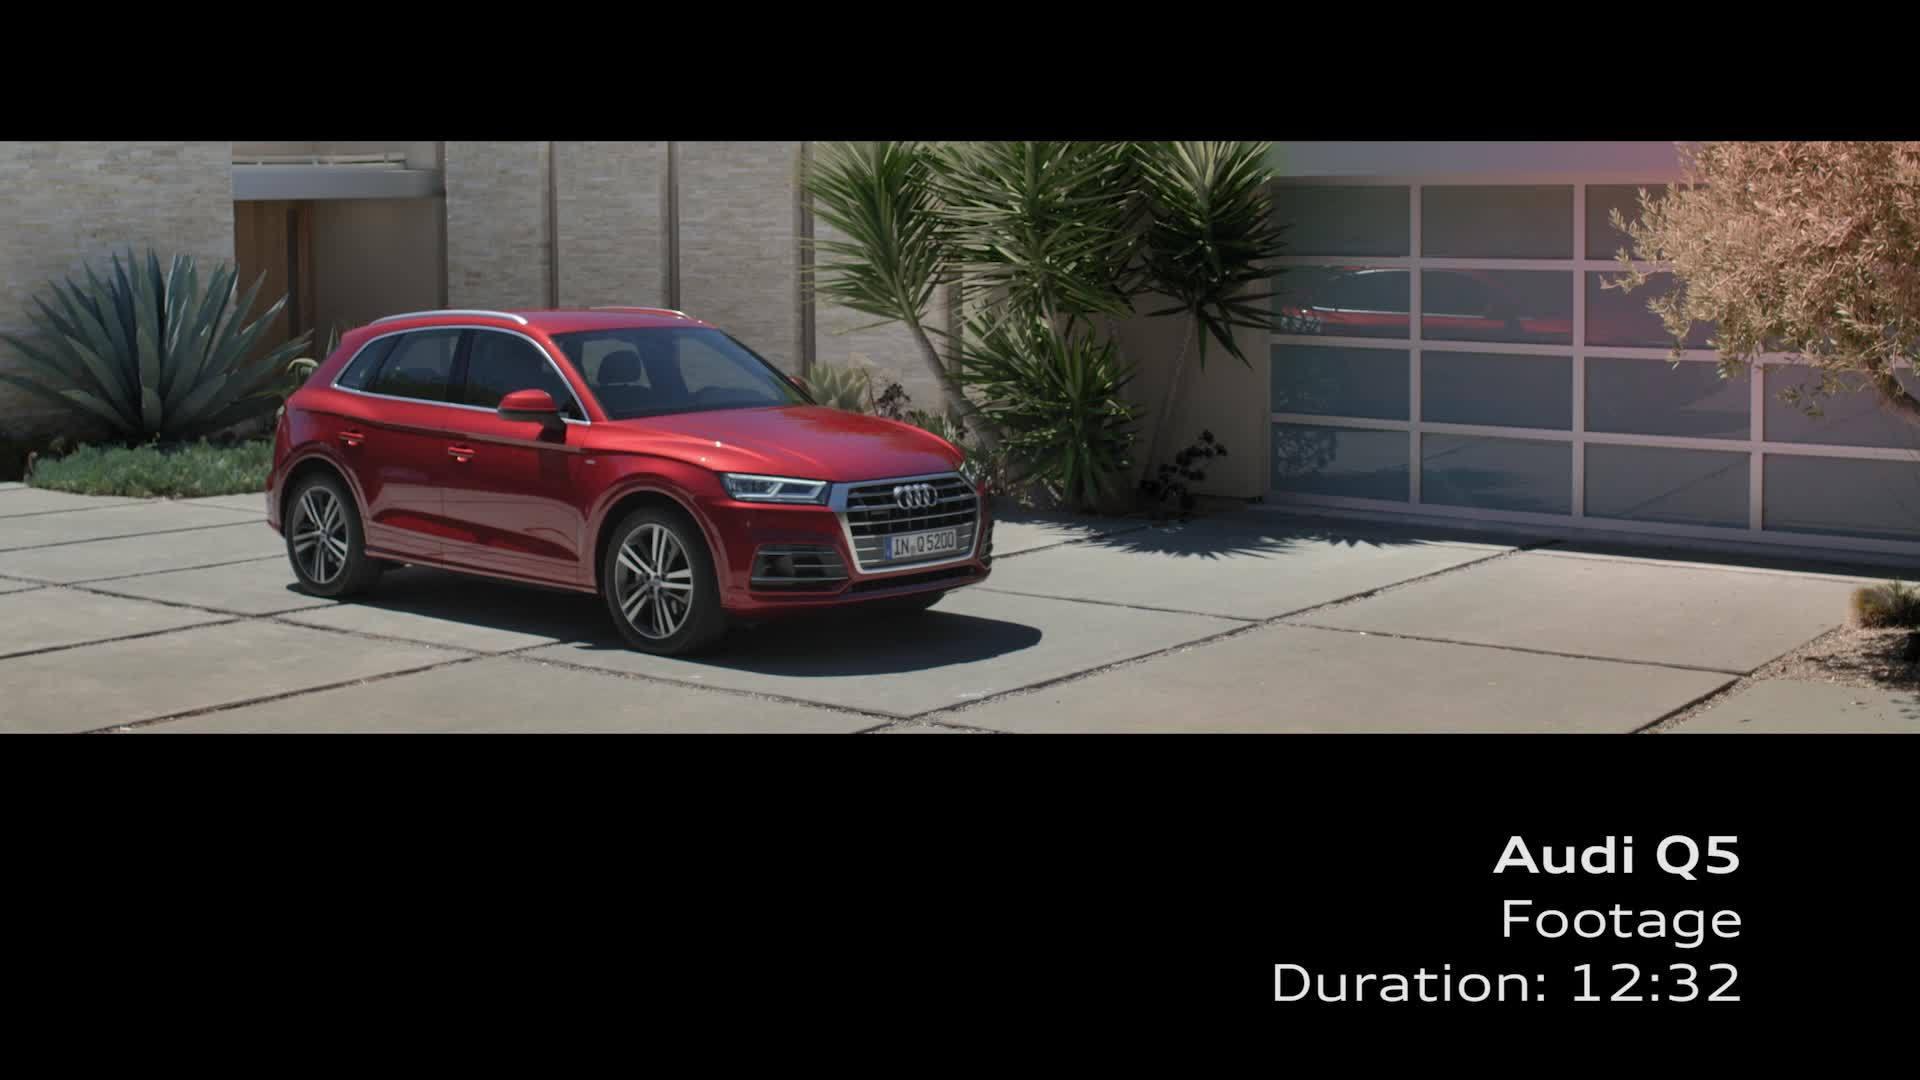 Audi Q5 - Footage Garnet red